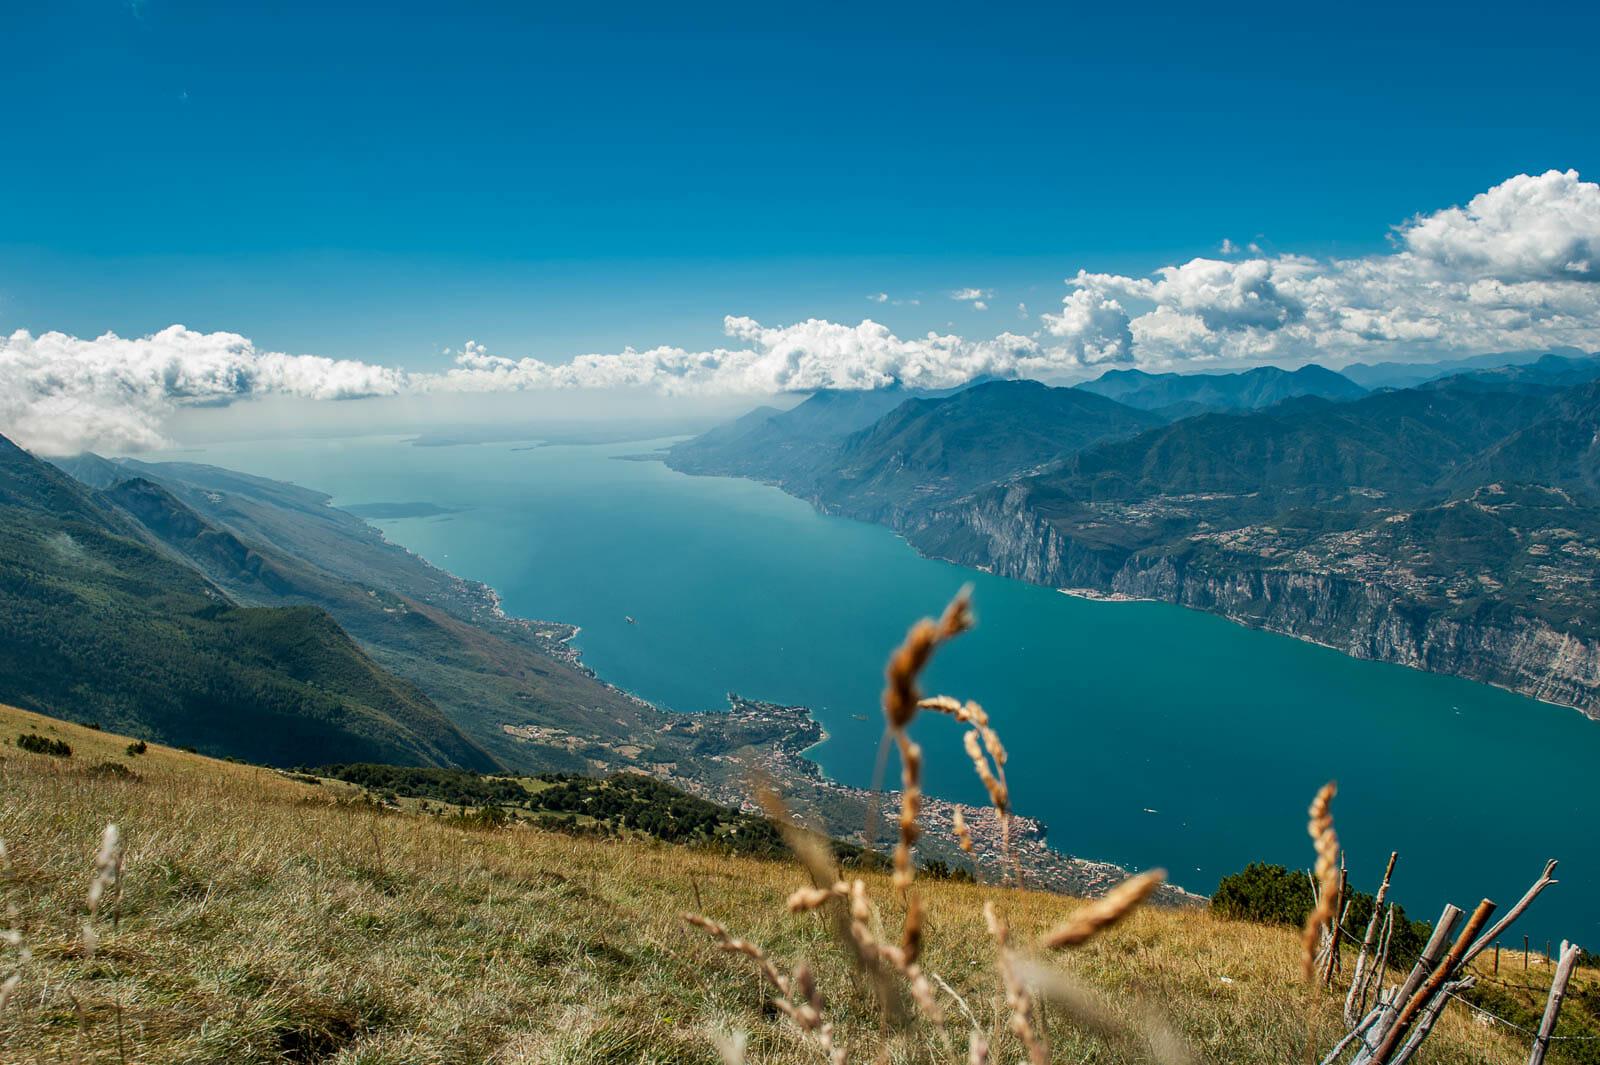 lake garda view from monte baldo